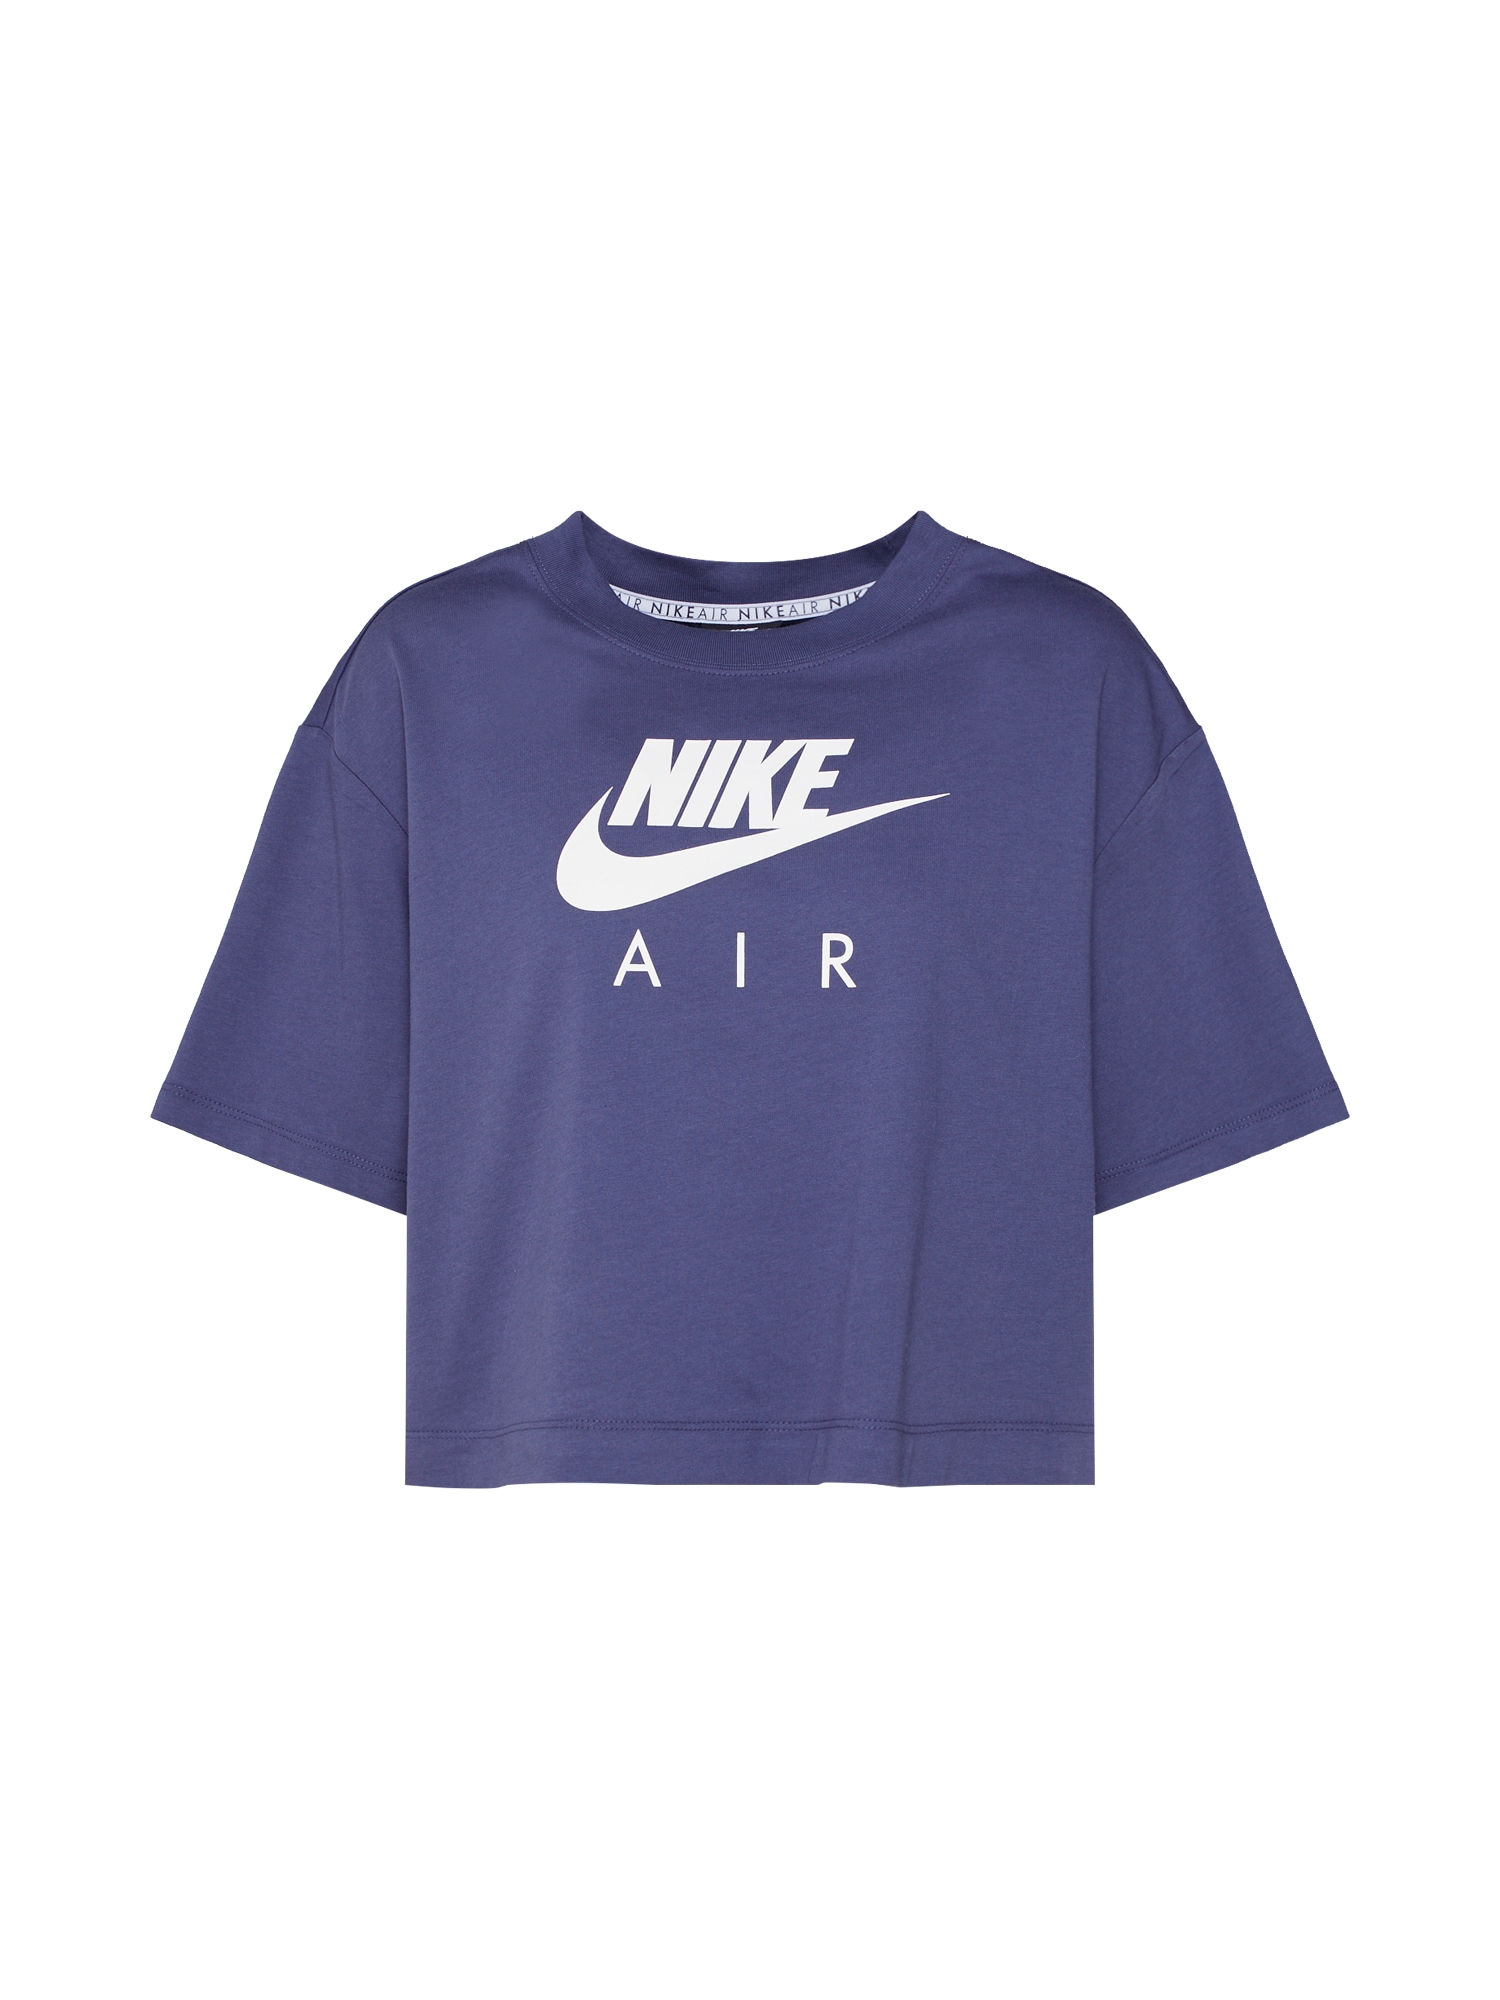 Tričko tmavě fialová bílá Nike Sportswear